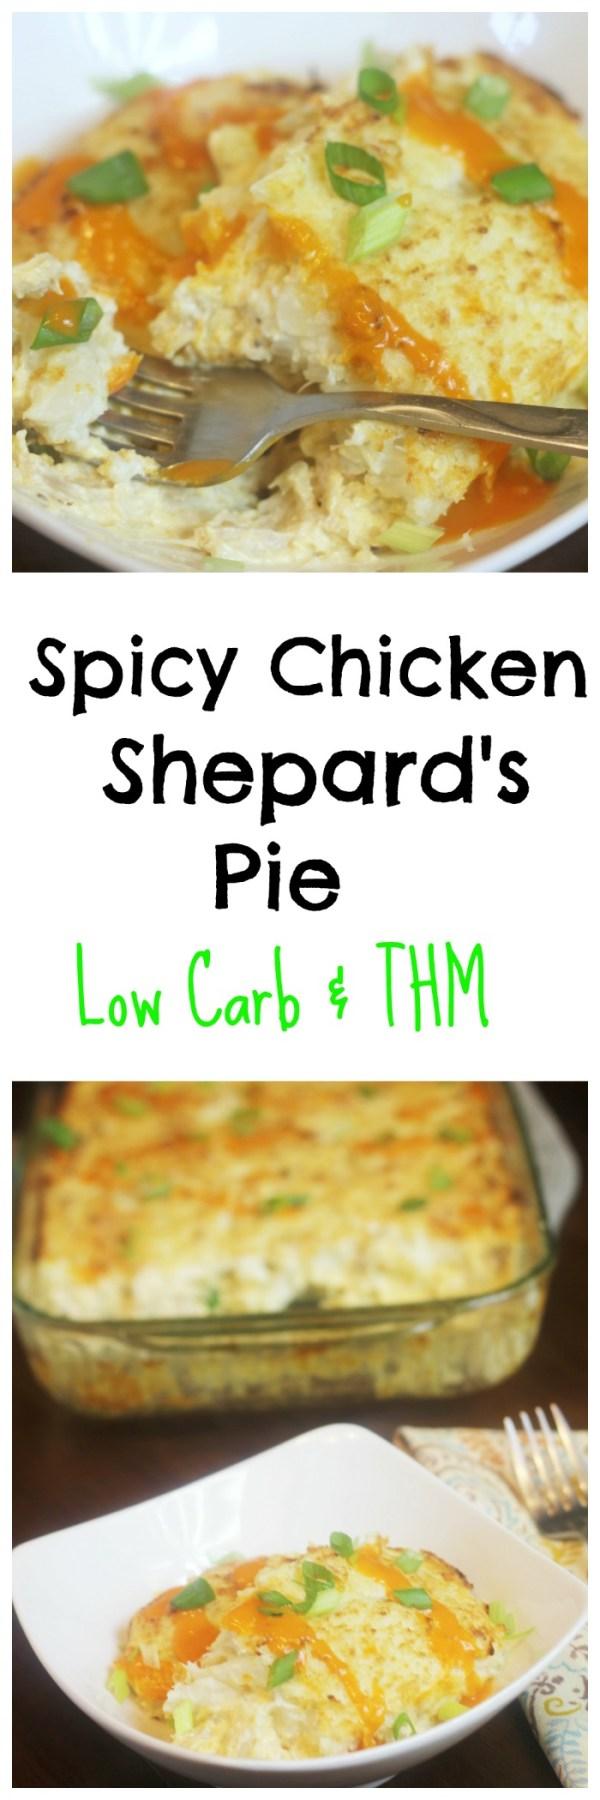 Spicy Chicken Shepard's Pie || Low Carb, THM Casserole, Buffalo Chicken